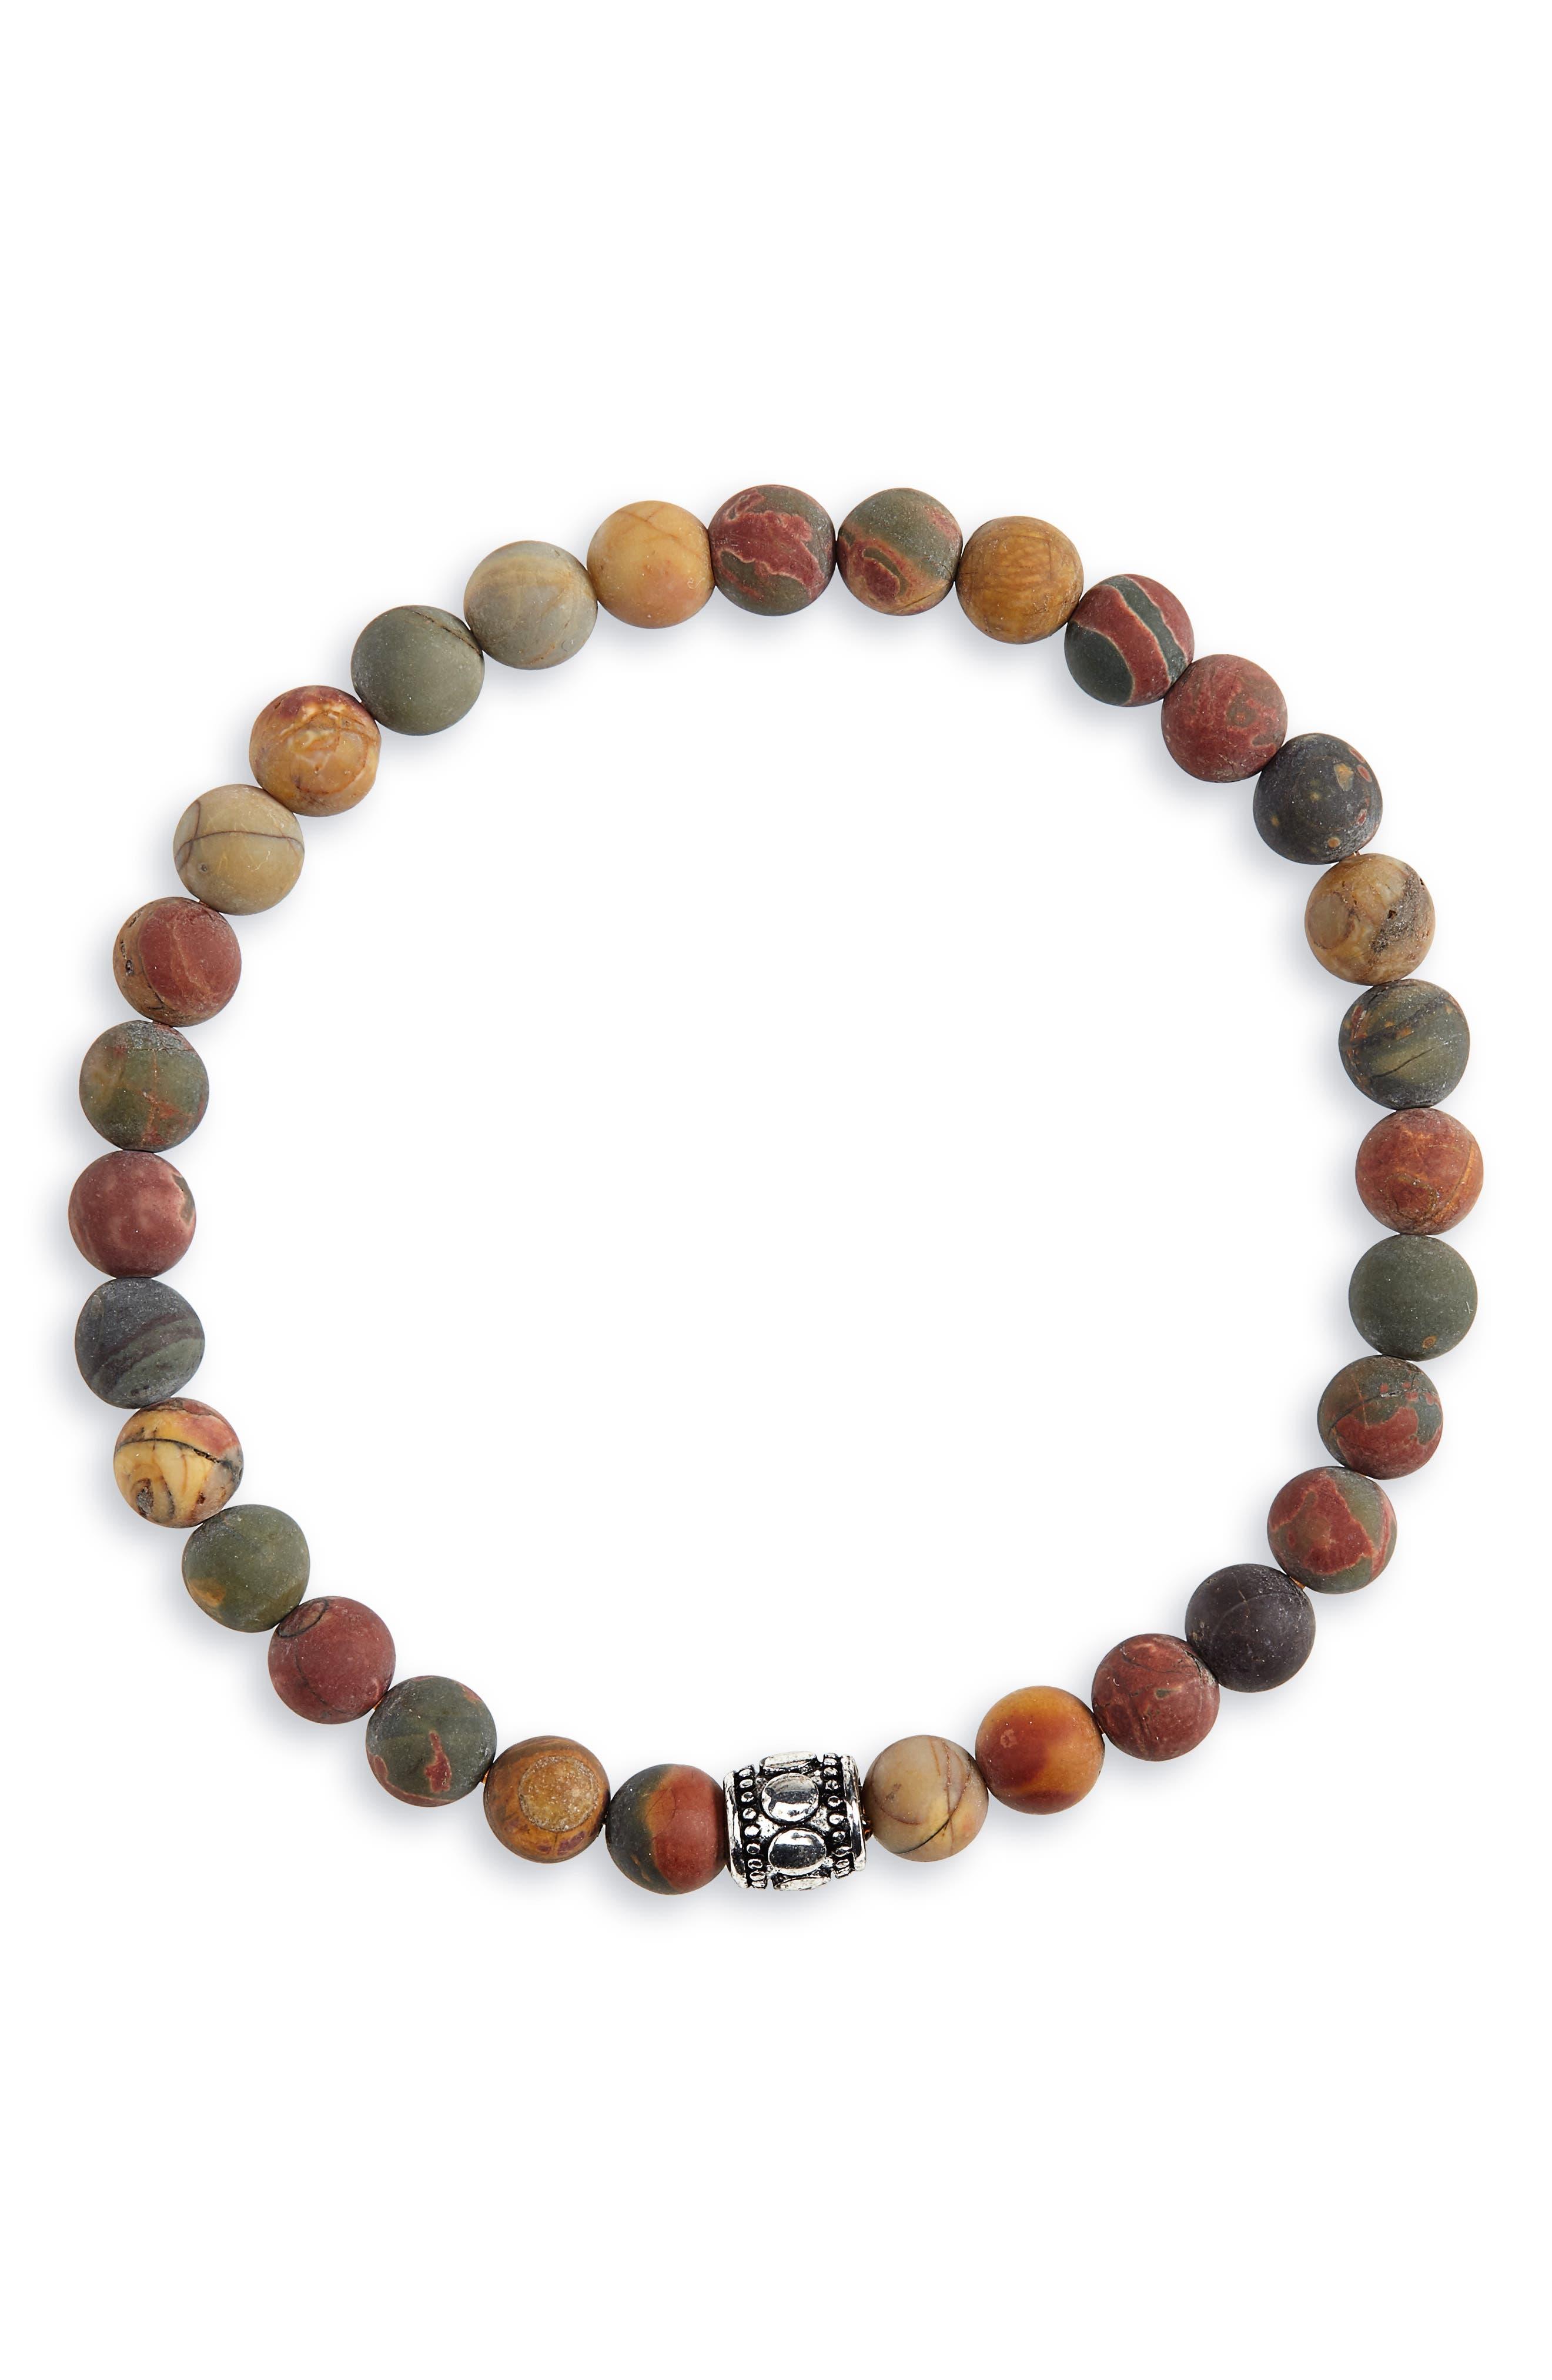 NORDSTROM MEN'S SHOP, Beaded Bracelet, Main thumbnail 1, color, BROWN/ NAVY